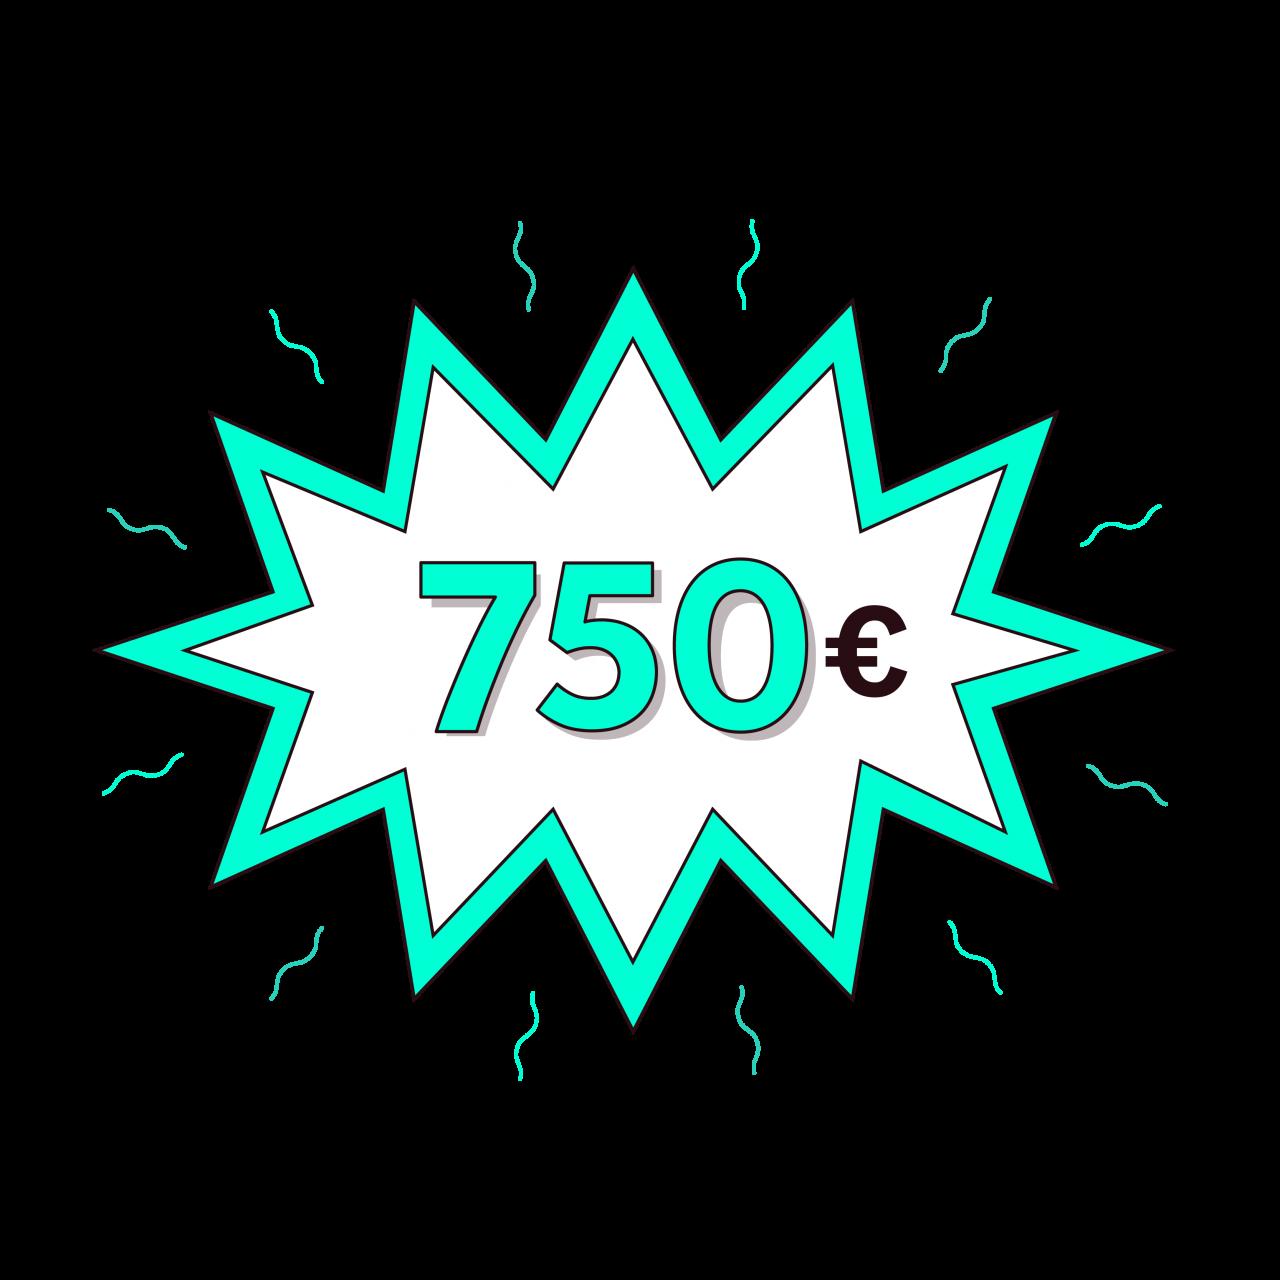 750_800x800